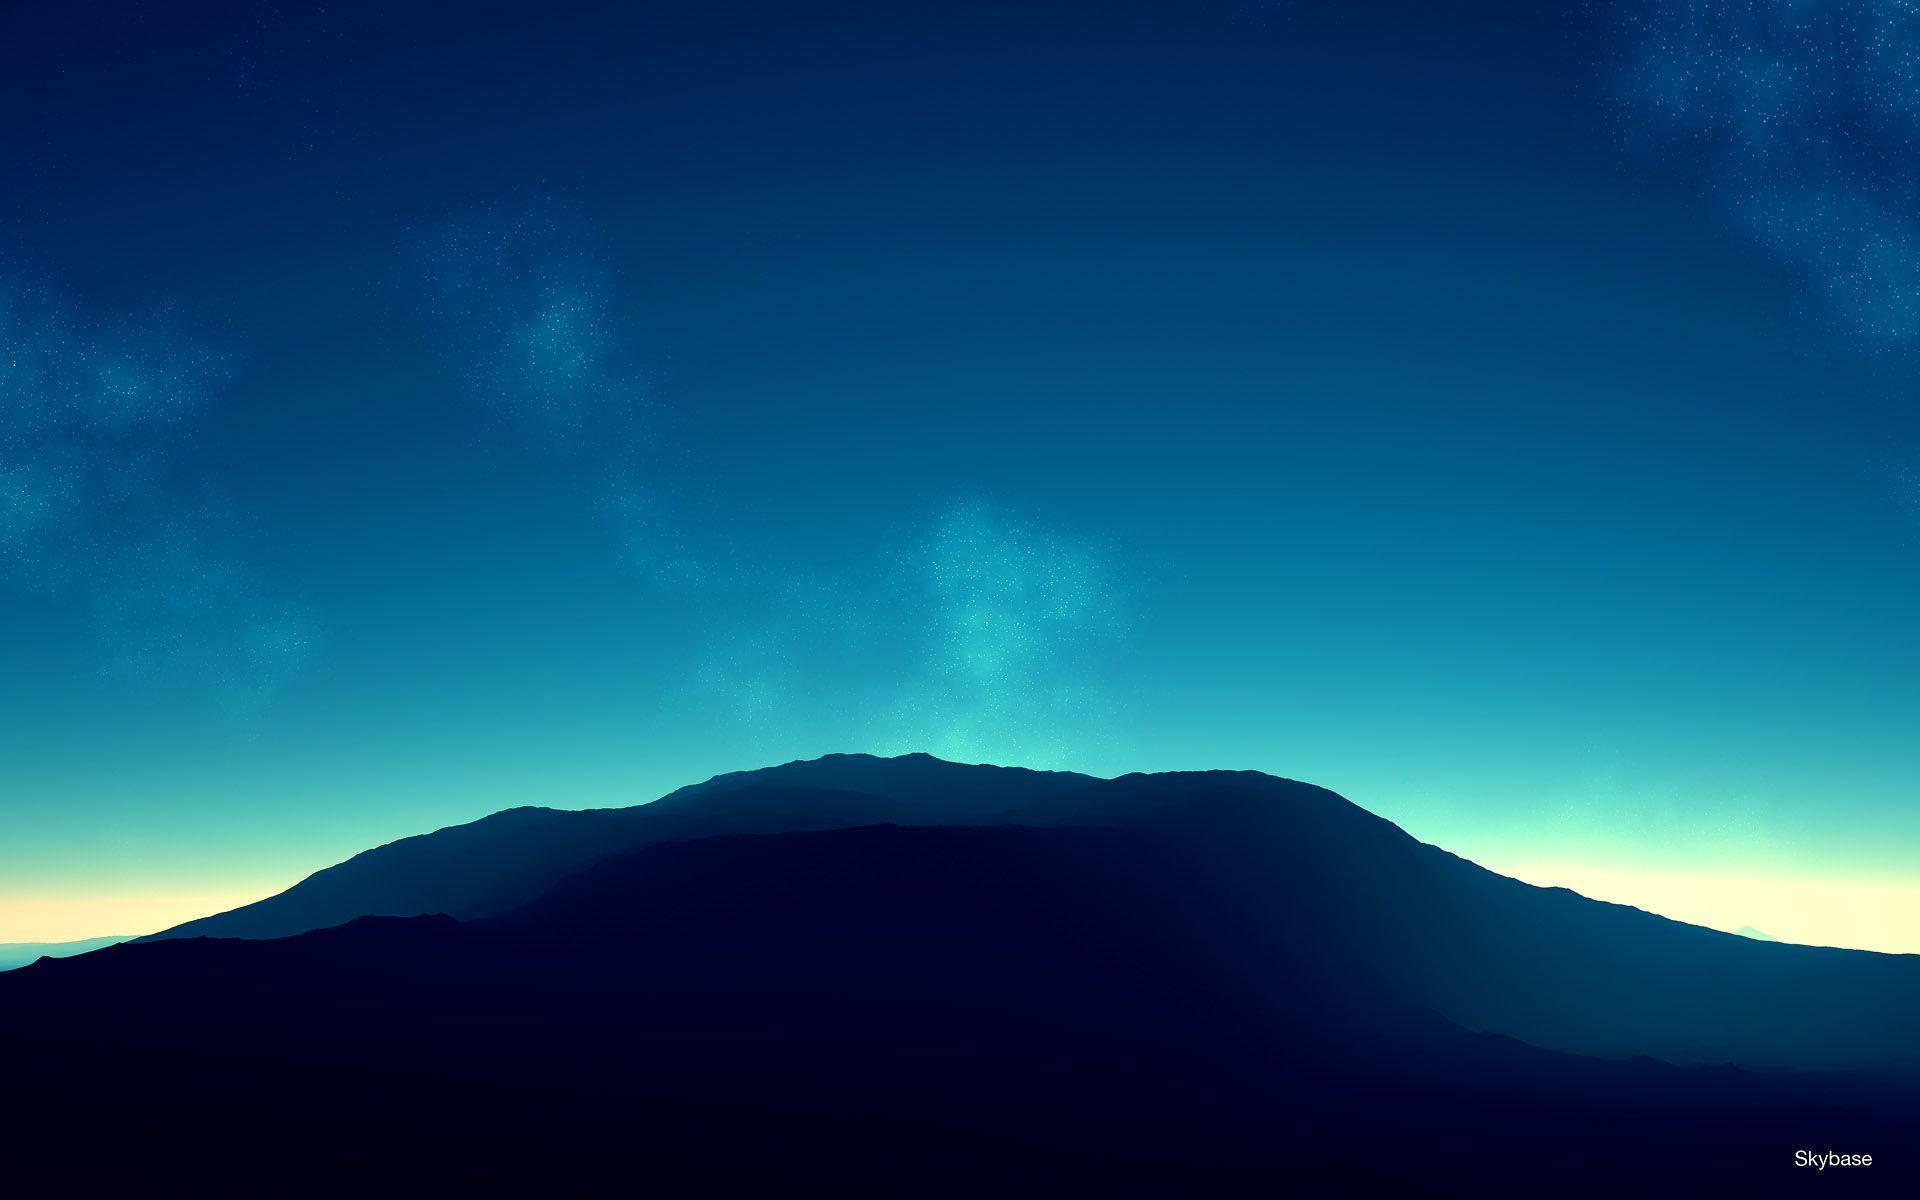 Good Wallpaper Mountain Blue - 75036b502fd4b53f562e36818822b86d  HD_142647.jpg